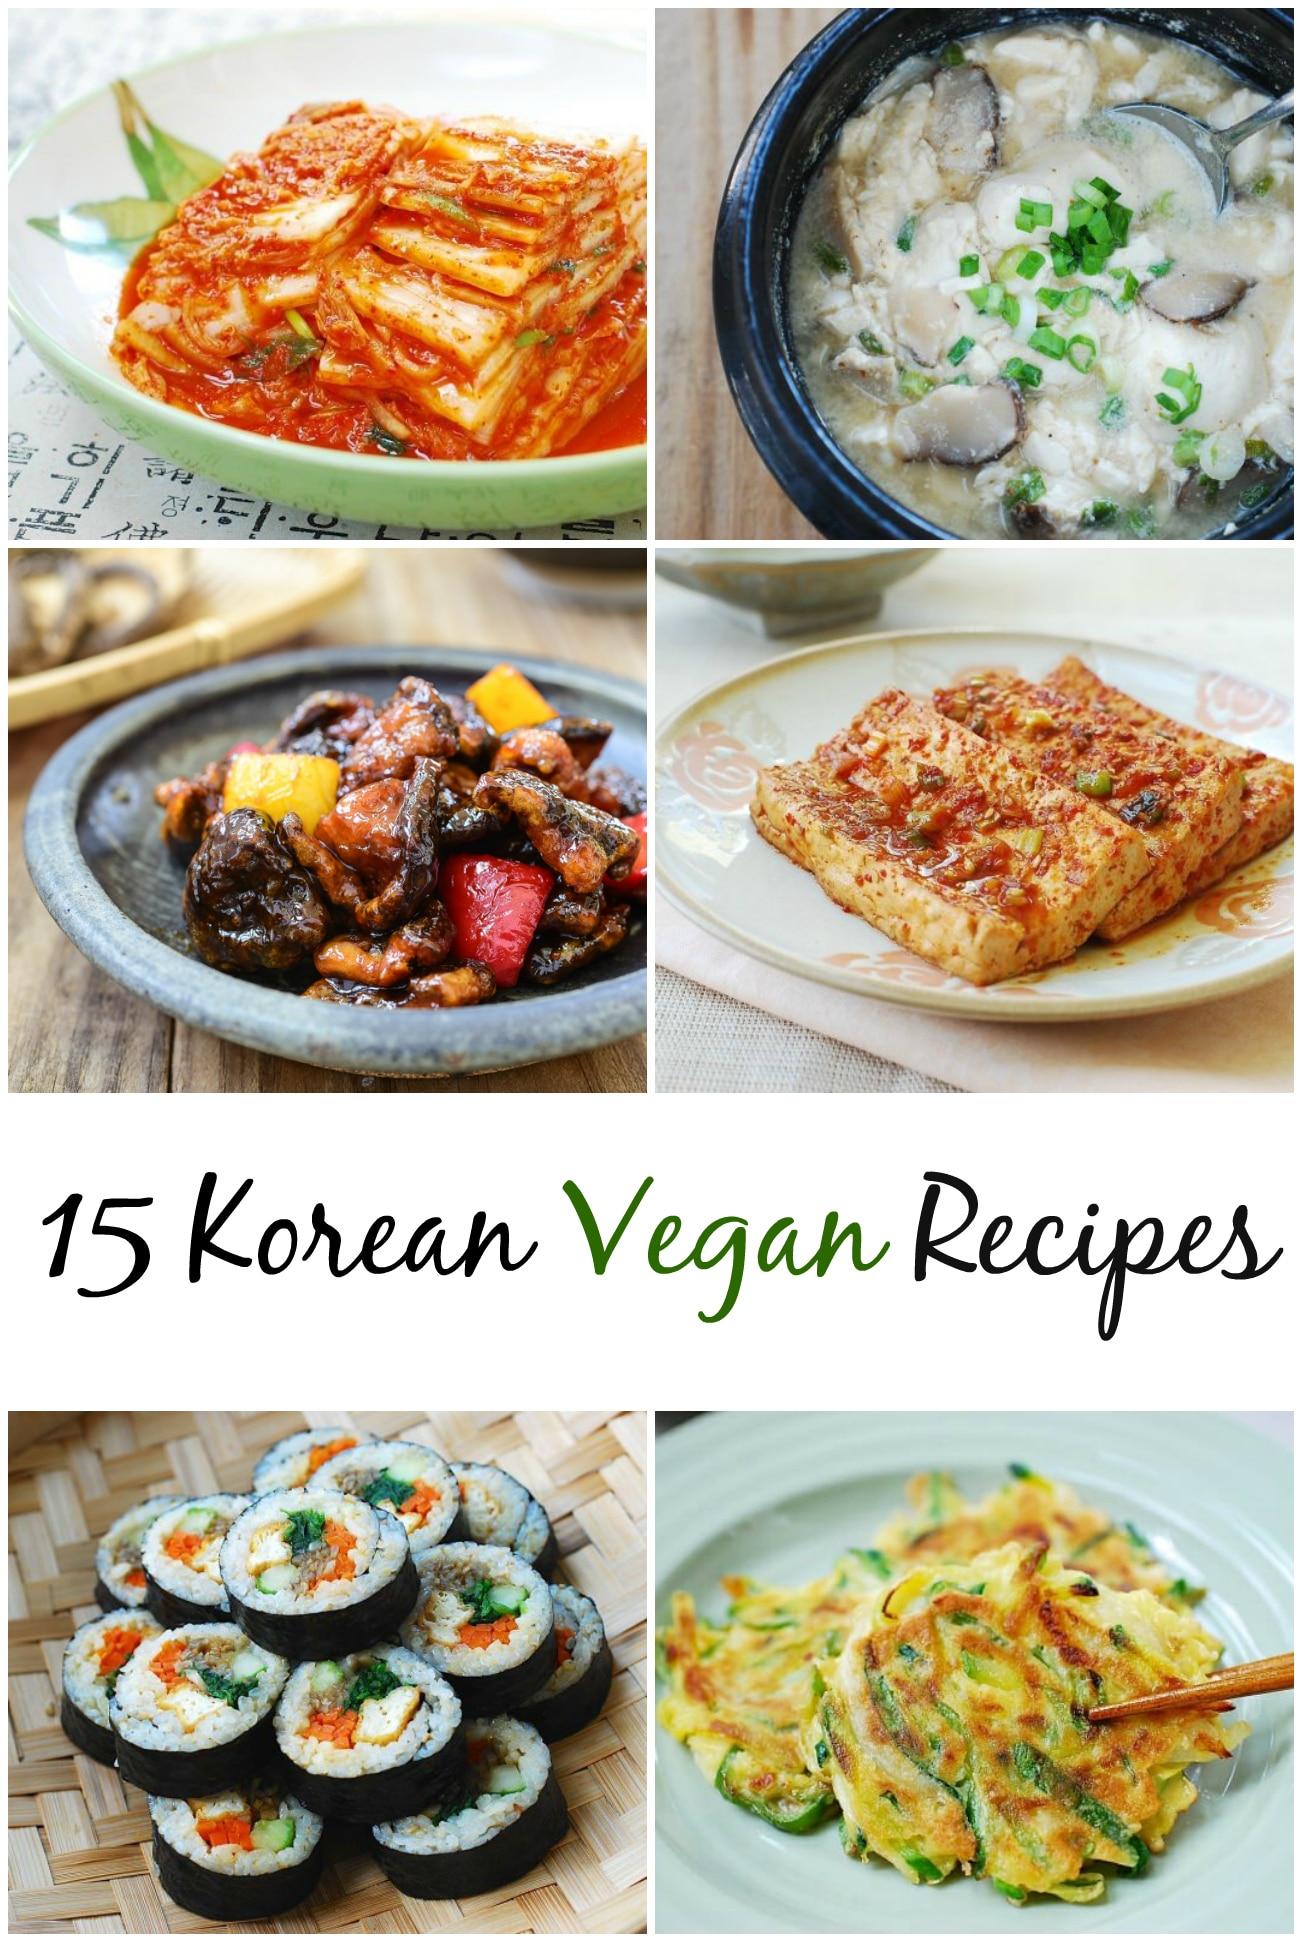 6-photo collage titled 15 Korean vegan recipes